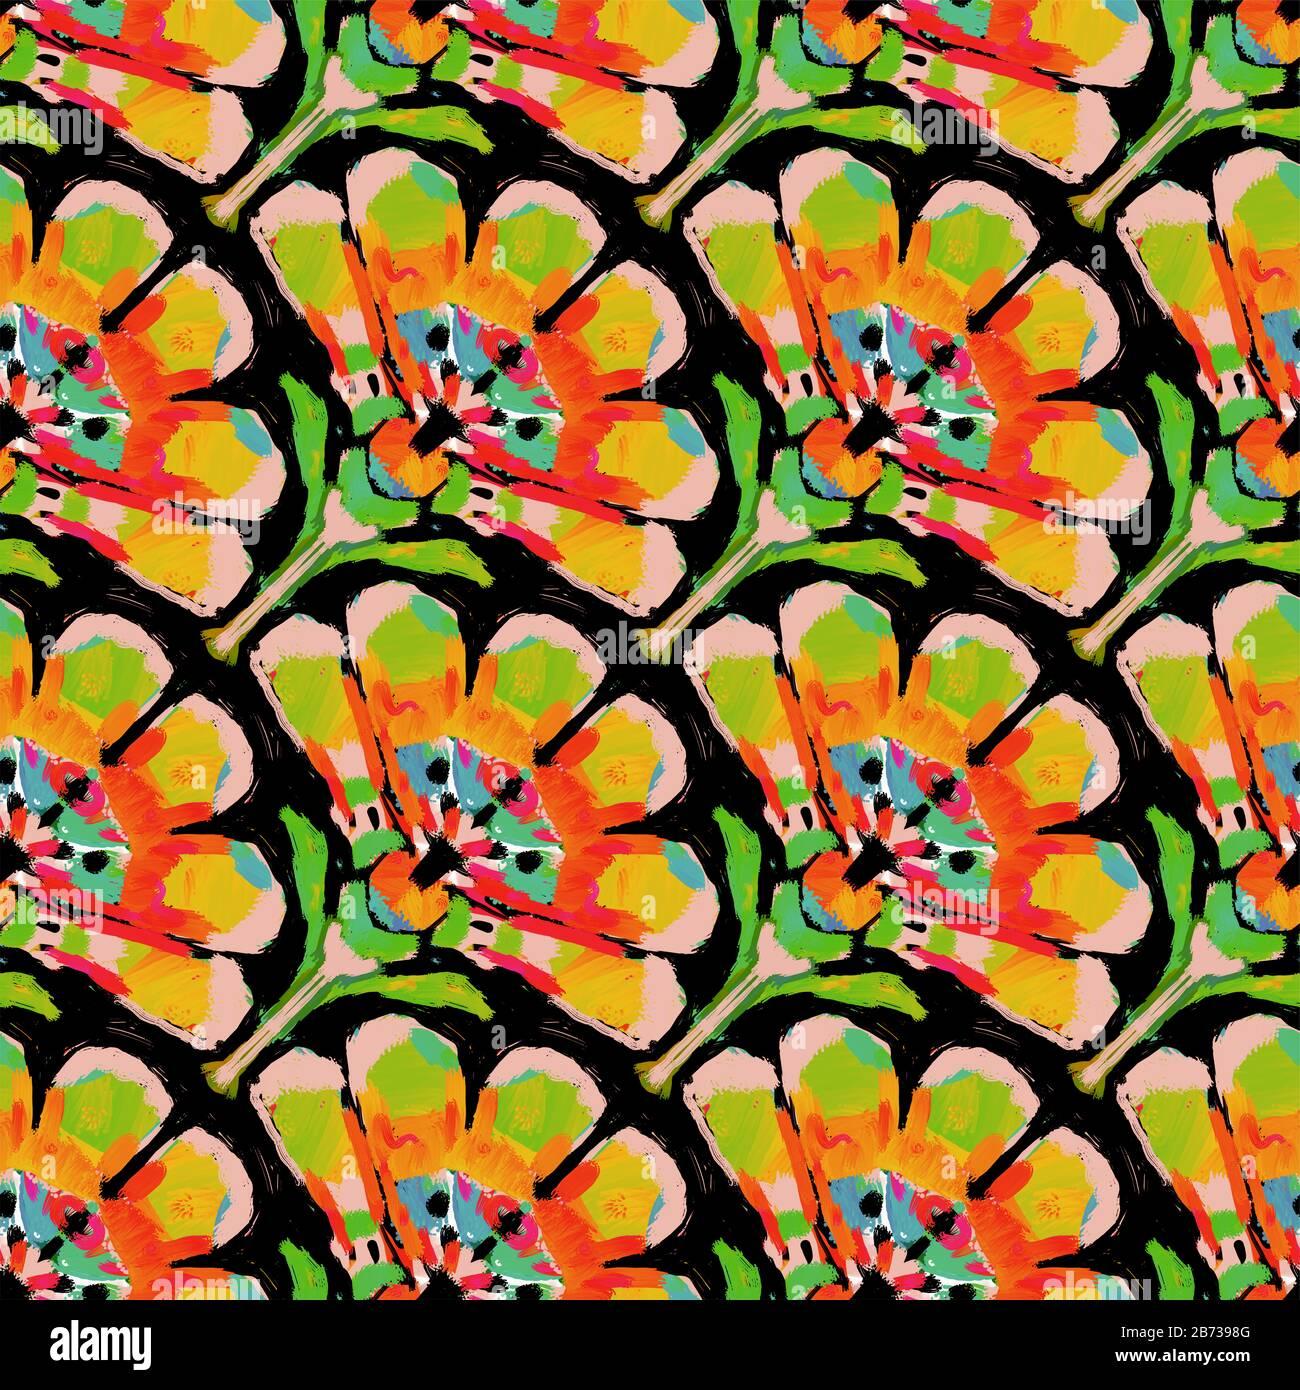 Vintage Retro Fabric Orange Stylized Flowers Mod Print Cotton